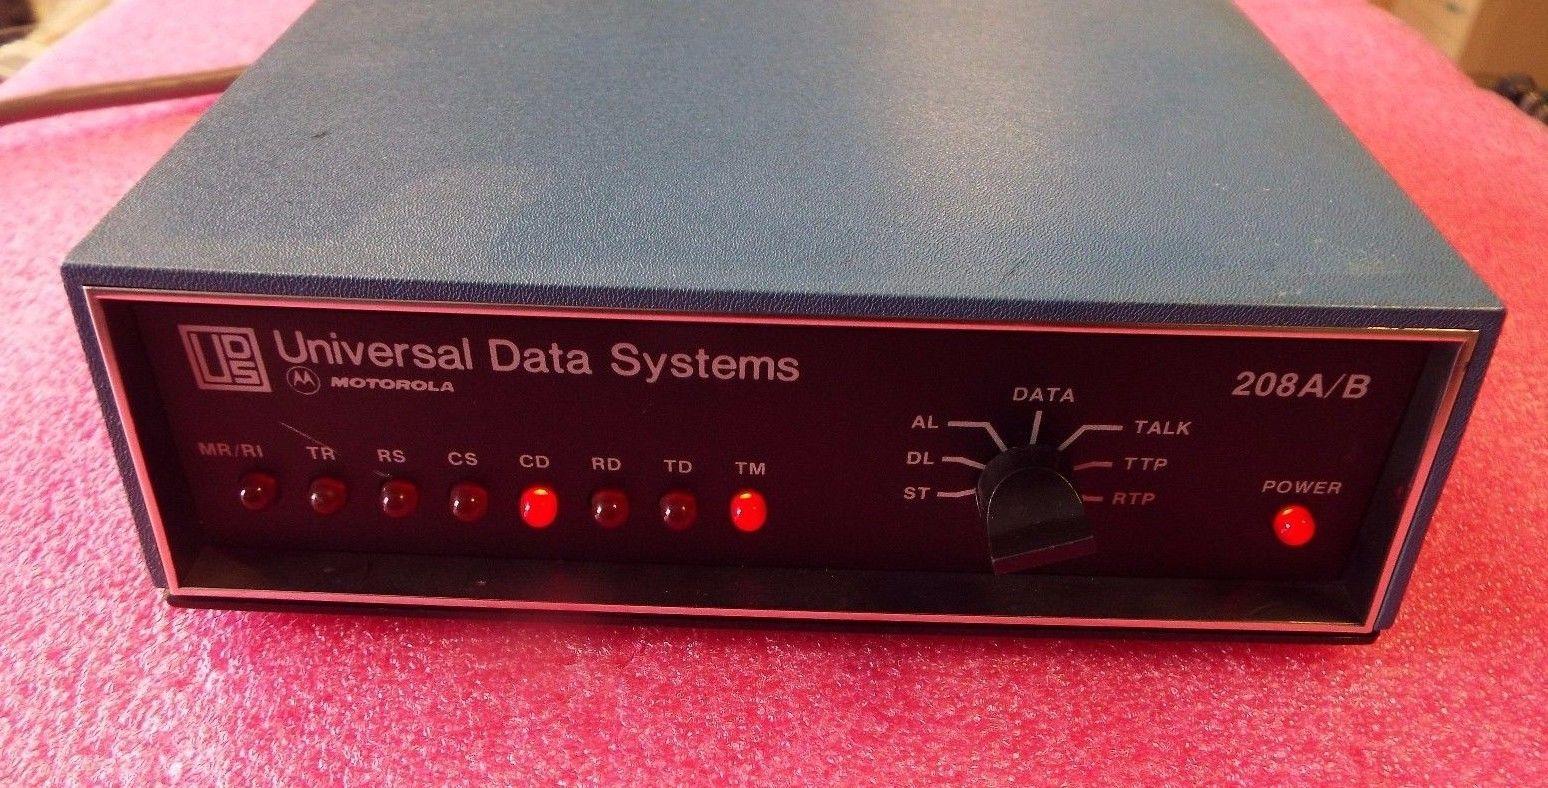 Motorola UDS Universal Data Systems 208 A/B